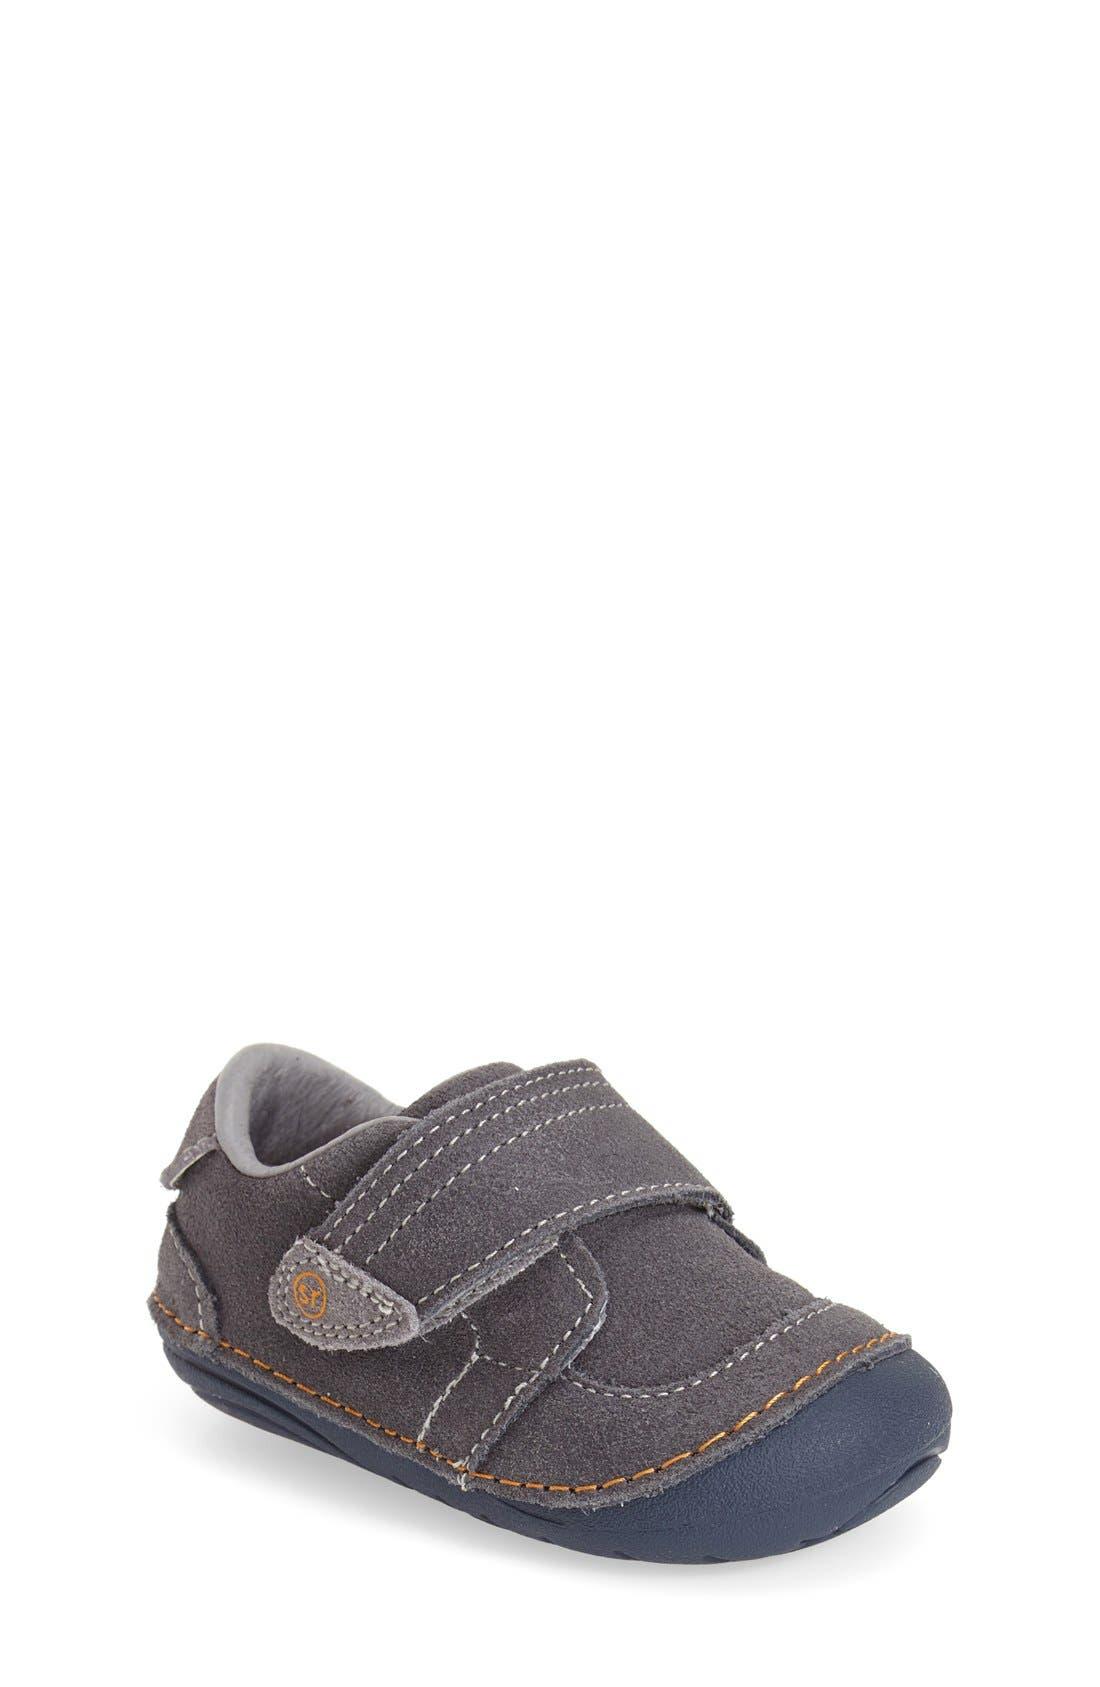 Alternate Image 1 Selected - Stride Rite Soft Motion Kellen Sneaker (Baby & Walker)